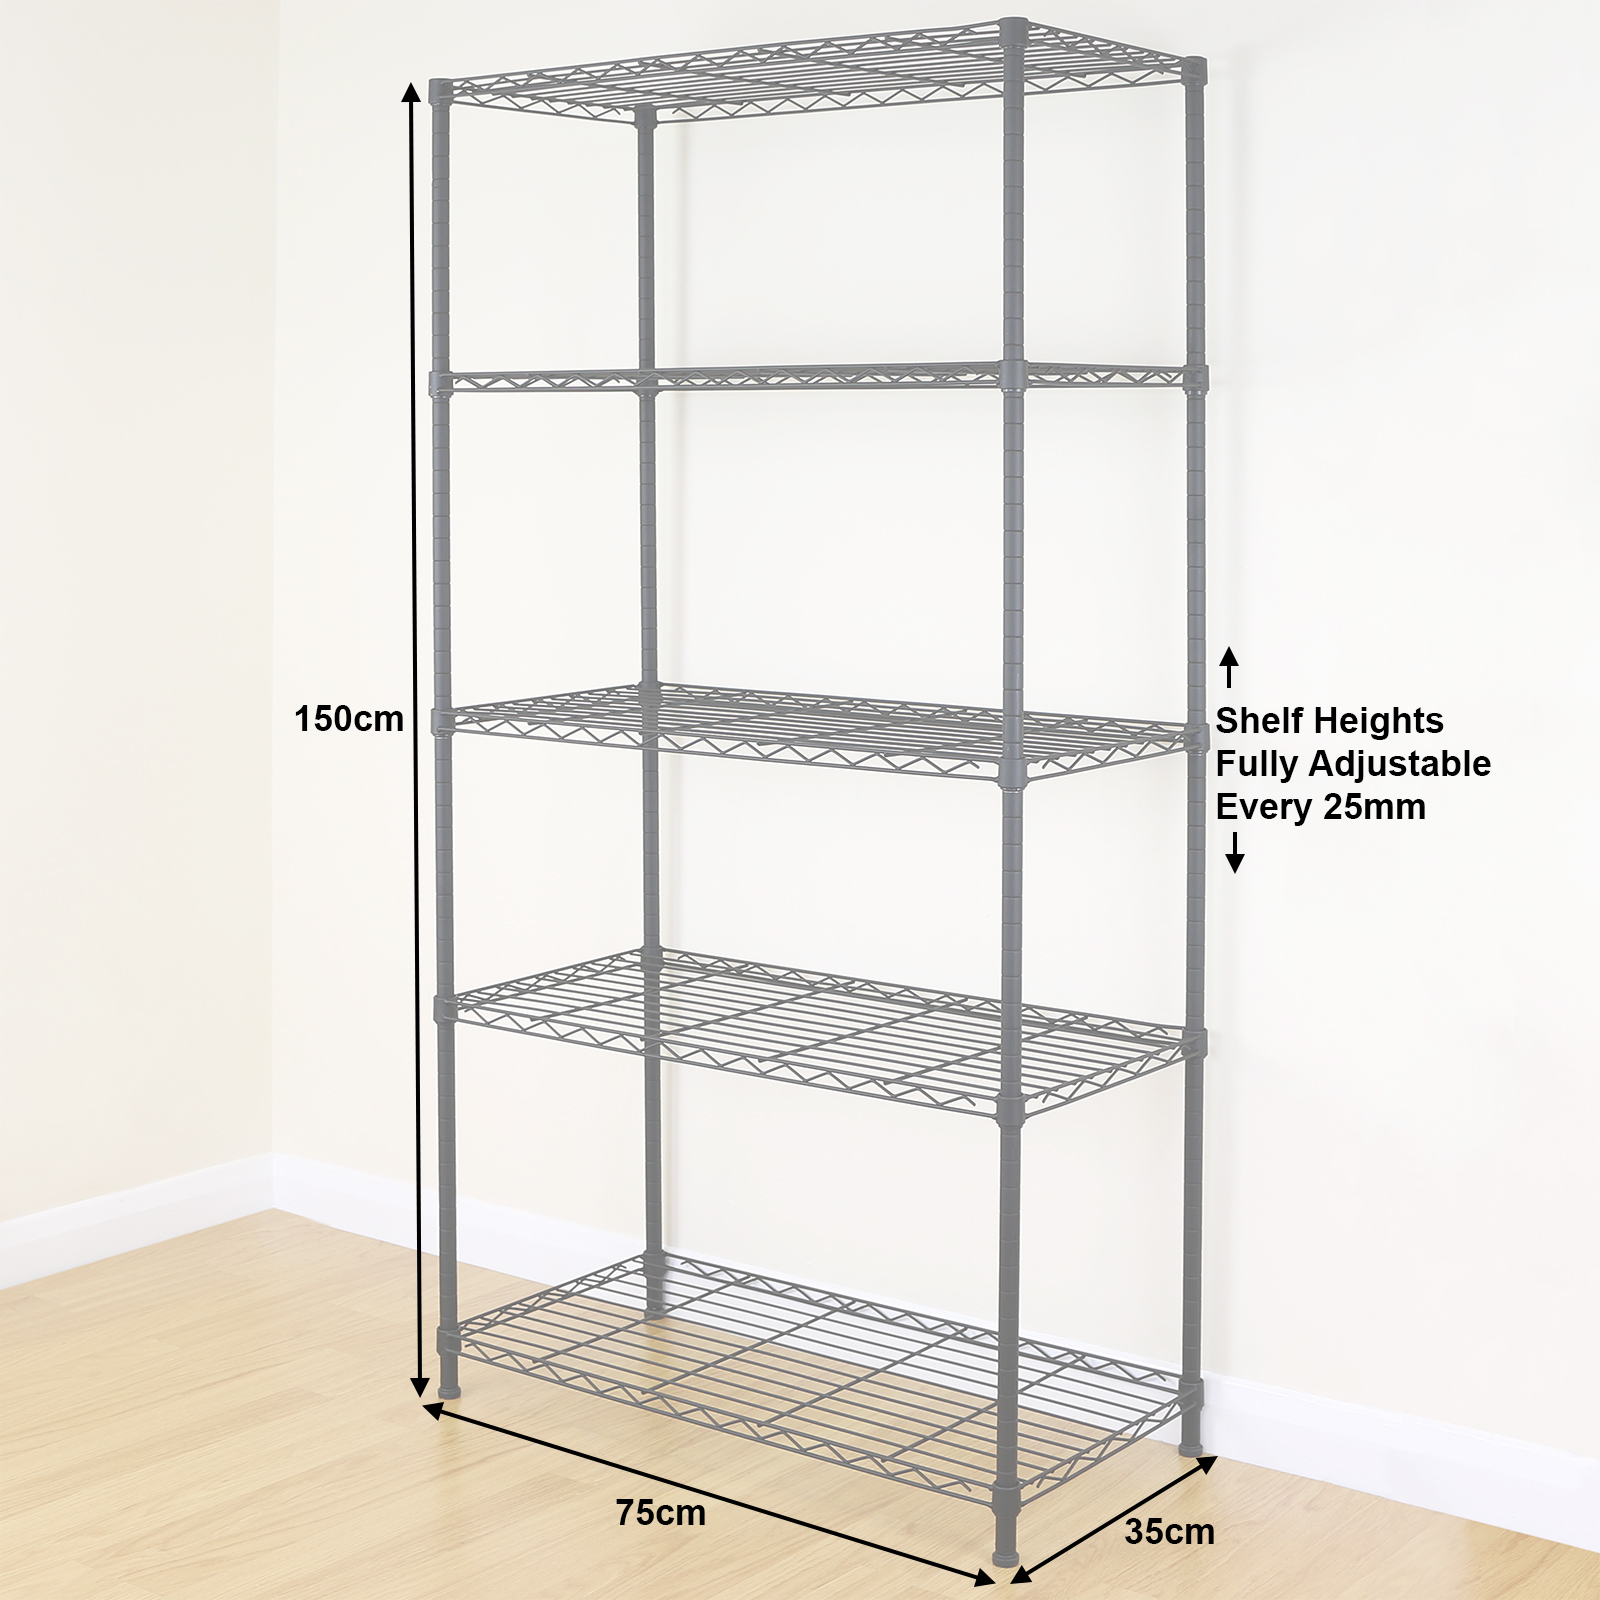 Kitchen Shelves Dimensions: 5 Tier Black Metal Storage Rack/Shelving Wire Shelf